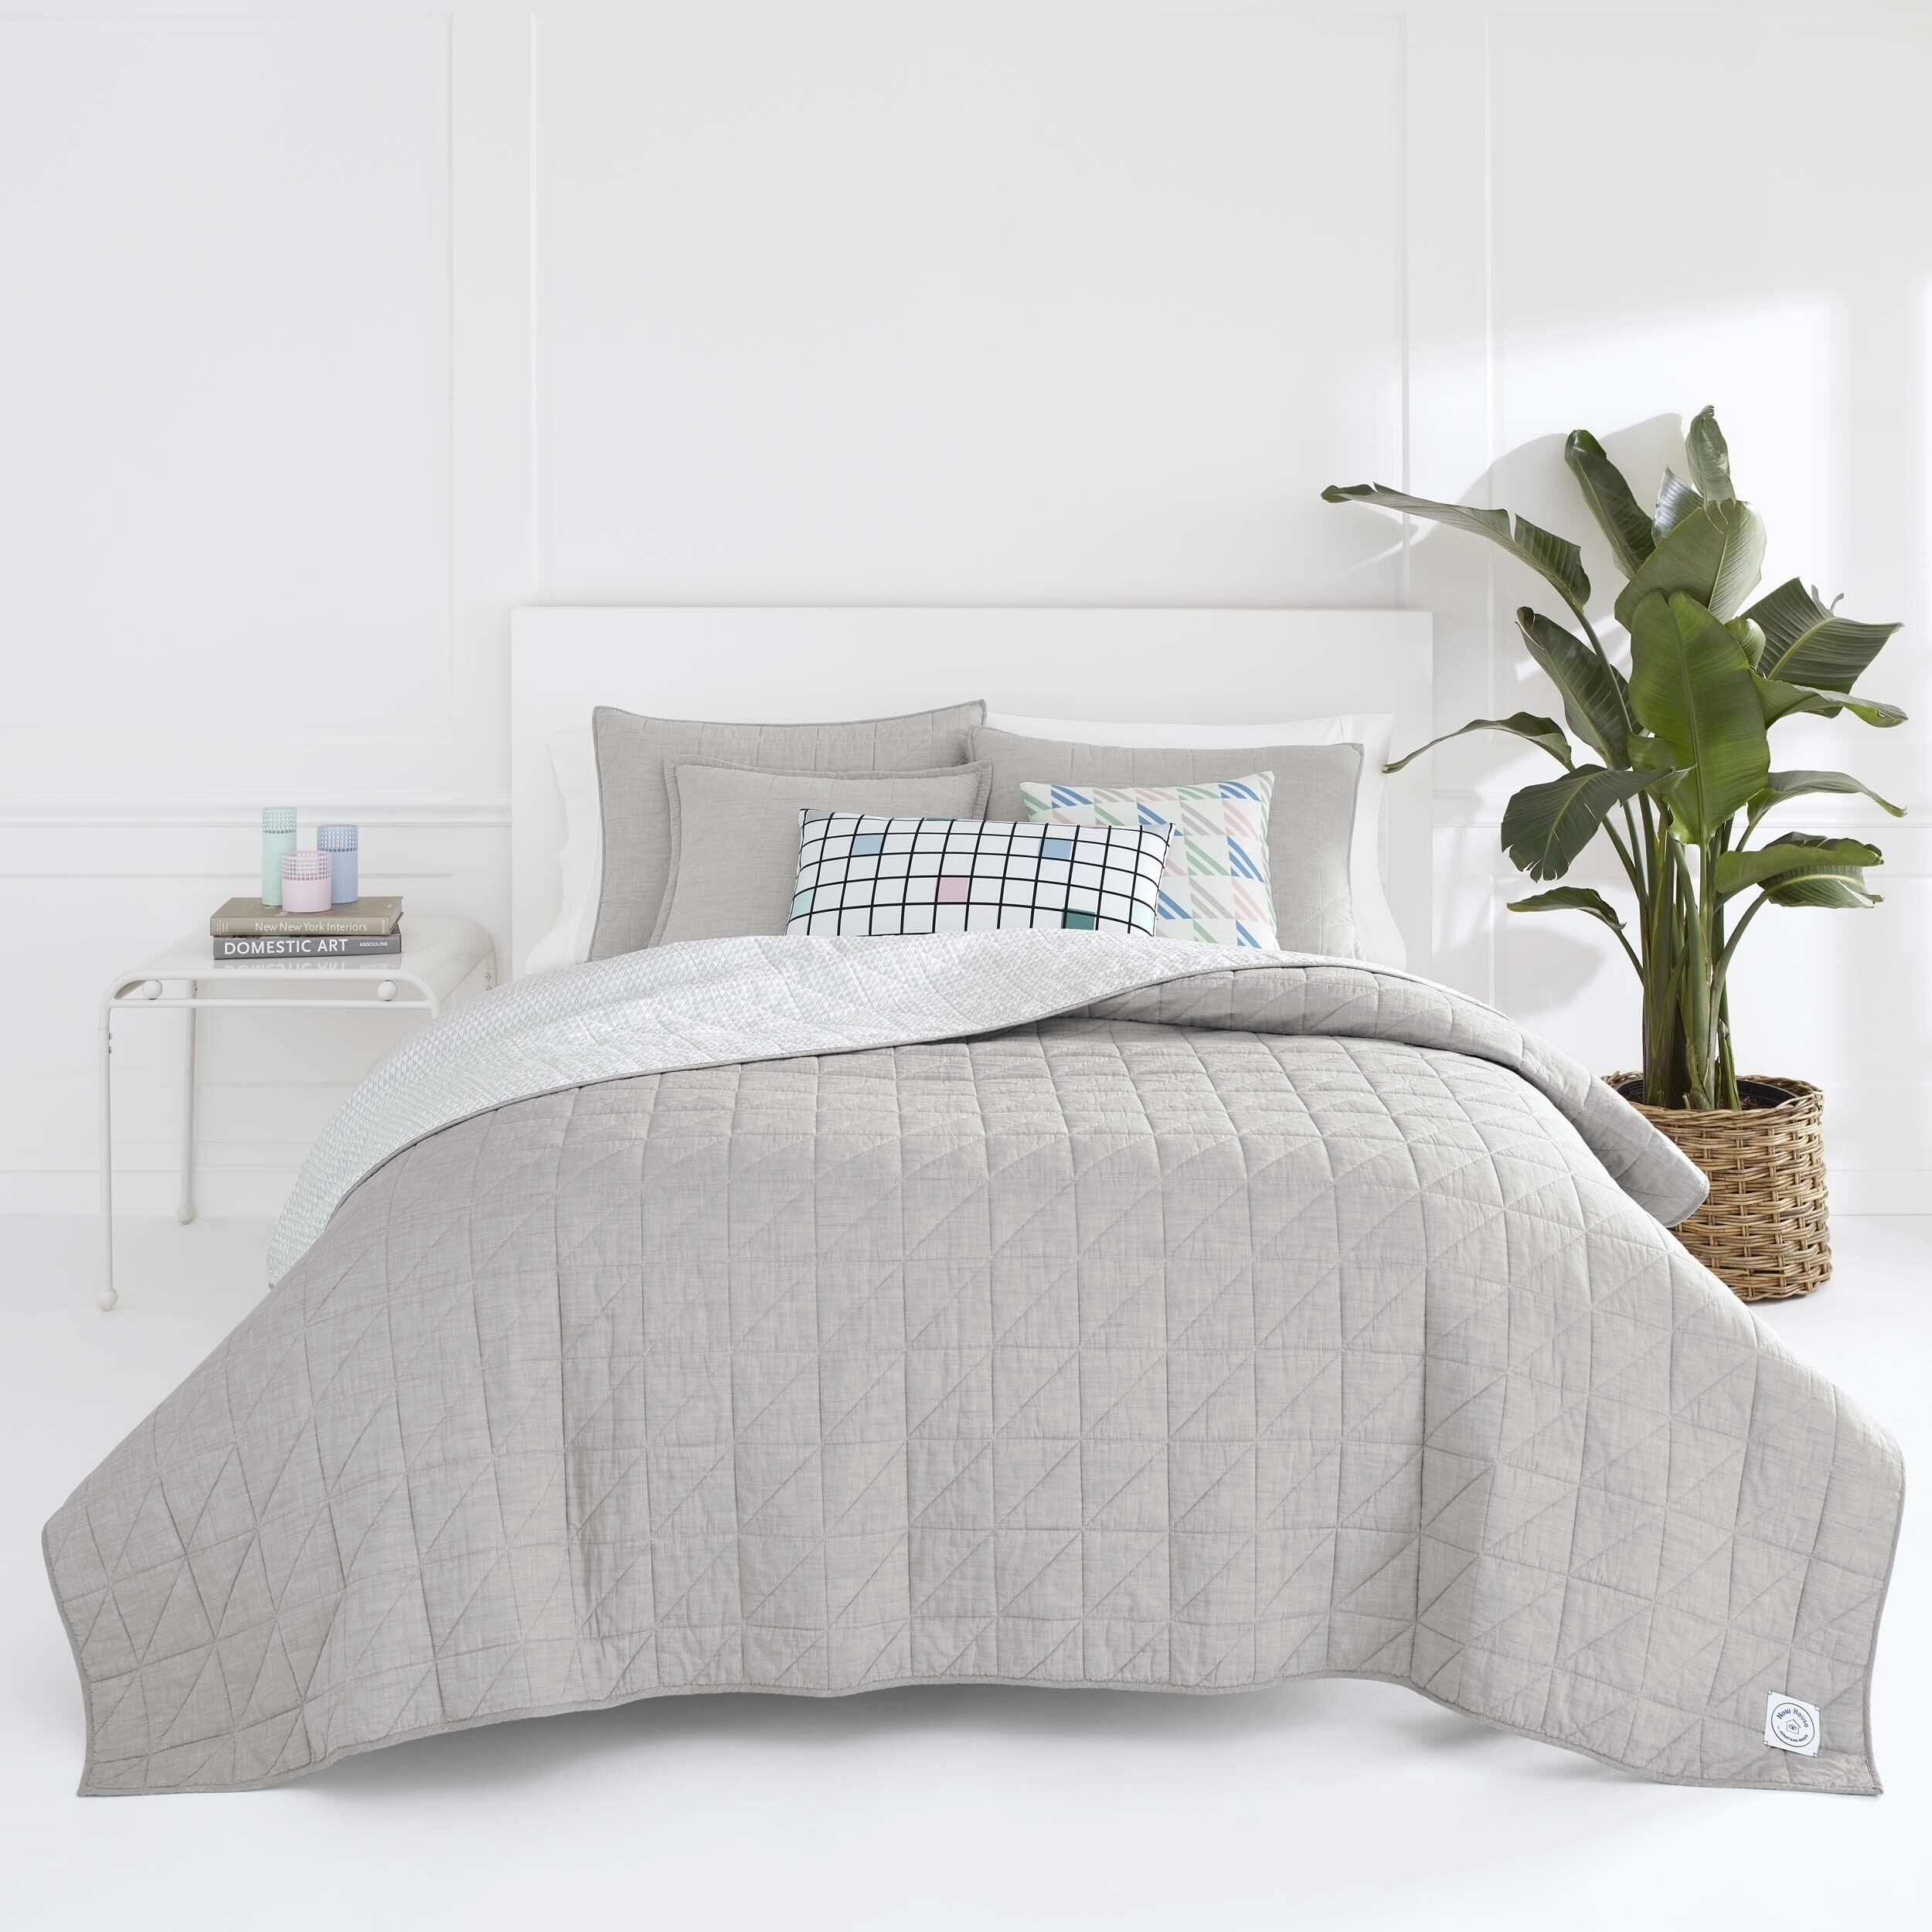 Bedding Sets Duvet Covers 100 Cotton Quilt Duvet Cover And 2 Pillowcase Bed Set Reversible Plain Dyed Home Furniture Diy Omnitel Com Na